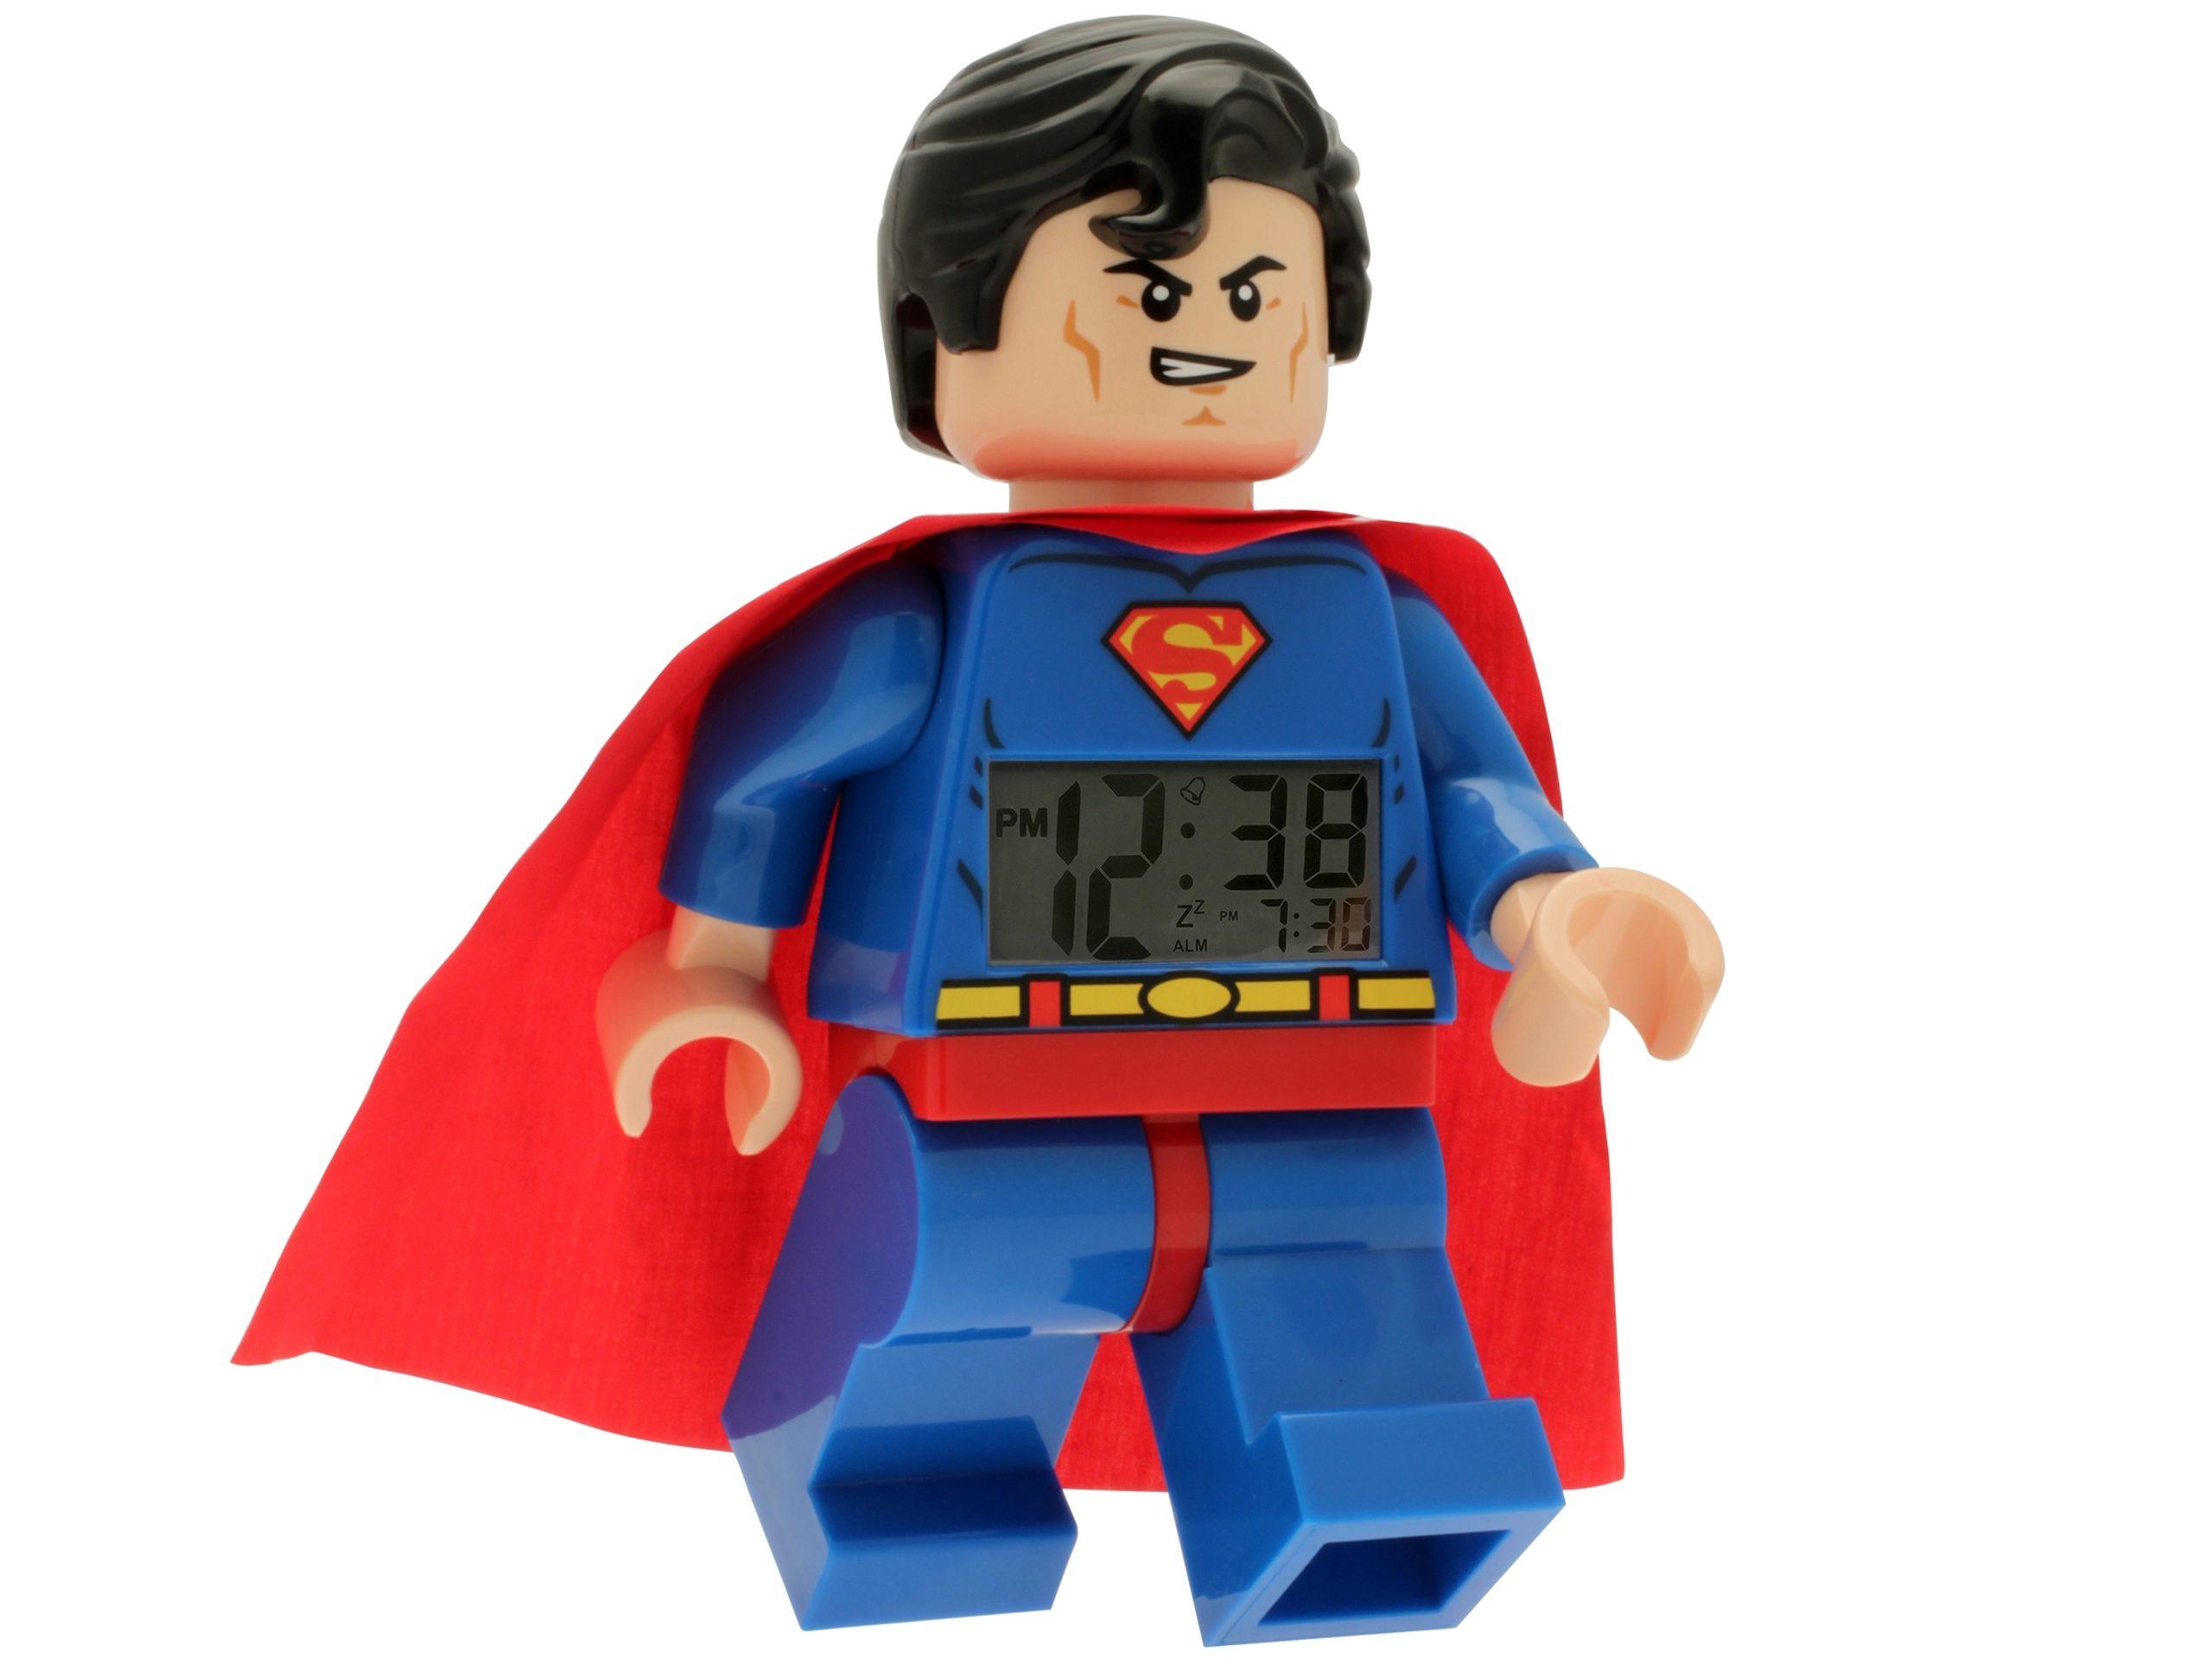 lego 5002424 dc comics super heroes superman minifigure clock scaled